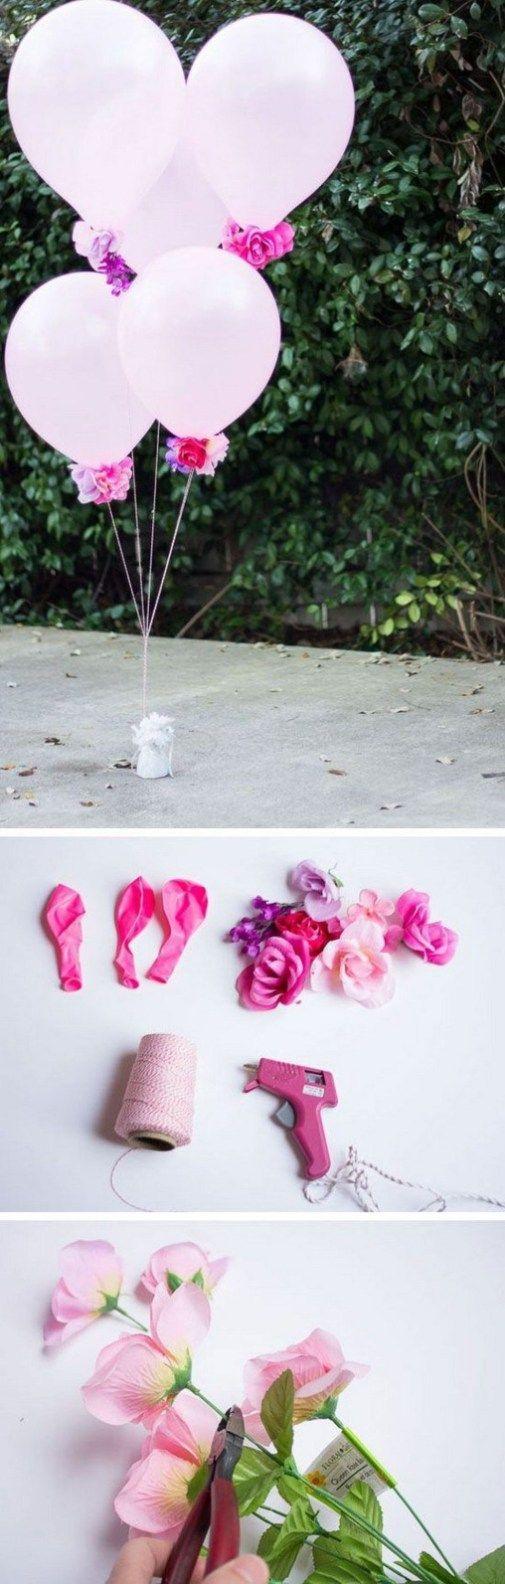 Diy wedding shower decorations  Incredible diy bridal shower decorations on a budget